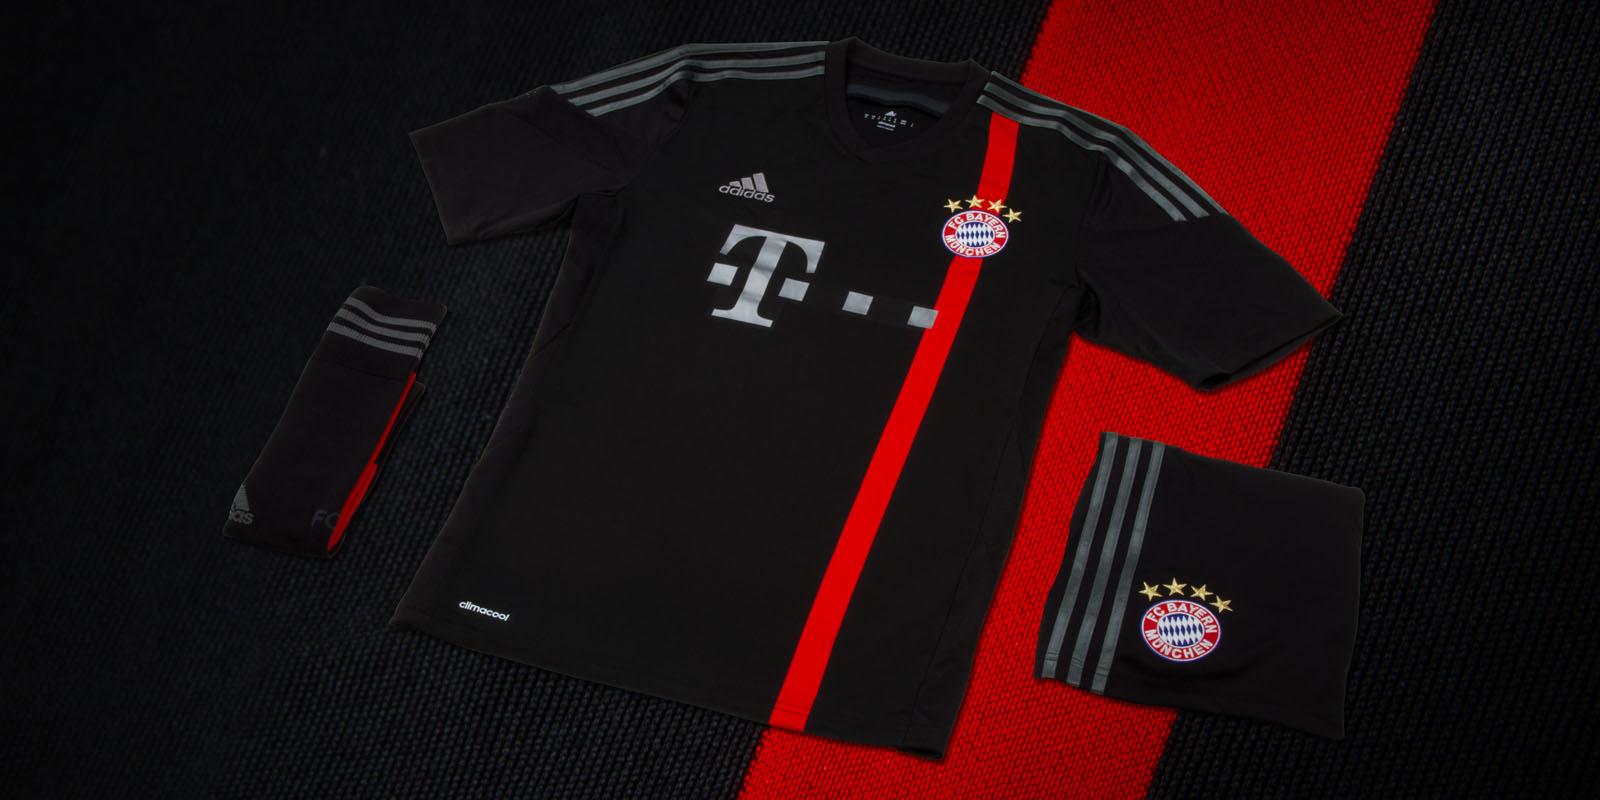 ... Away 2014-2015 F.C. Bayern Munchen ~ The Bavarians - Page 15 ... b419c1078